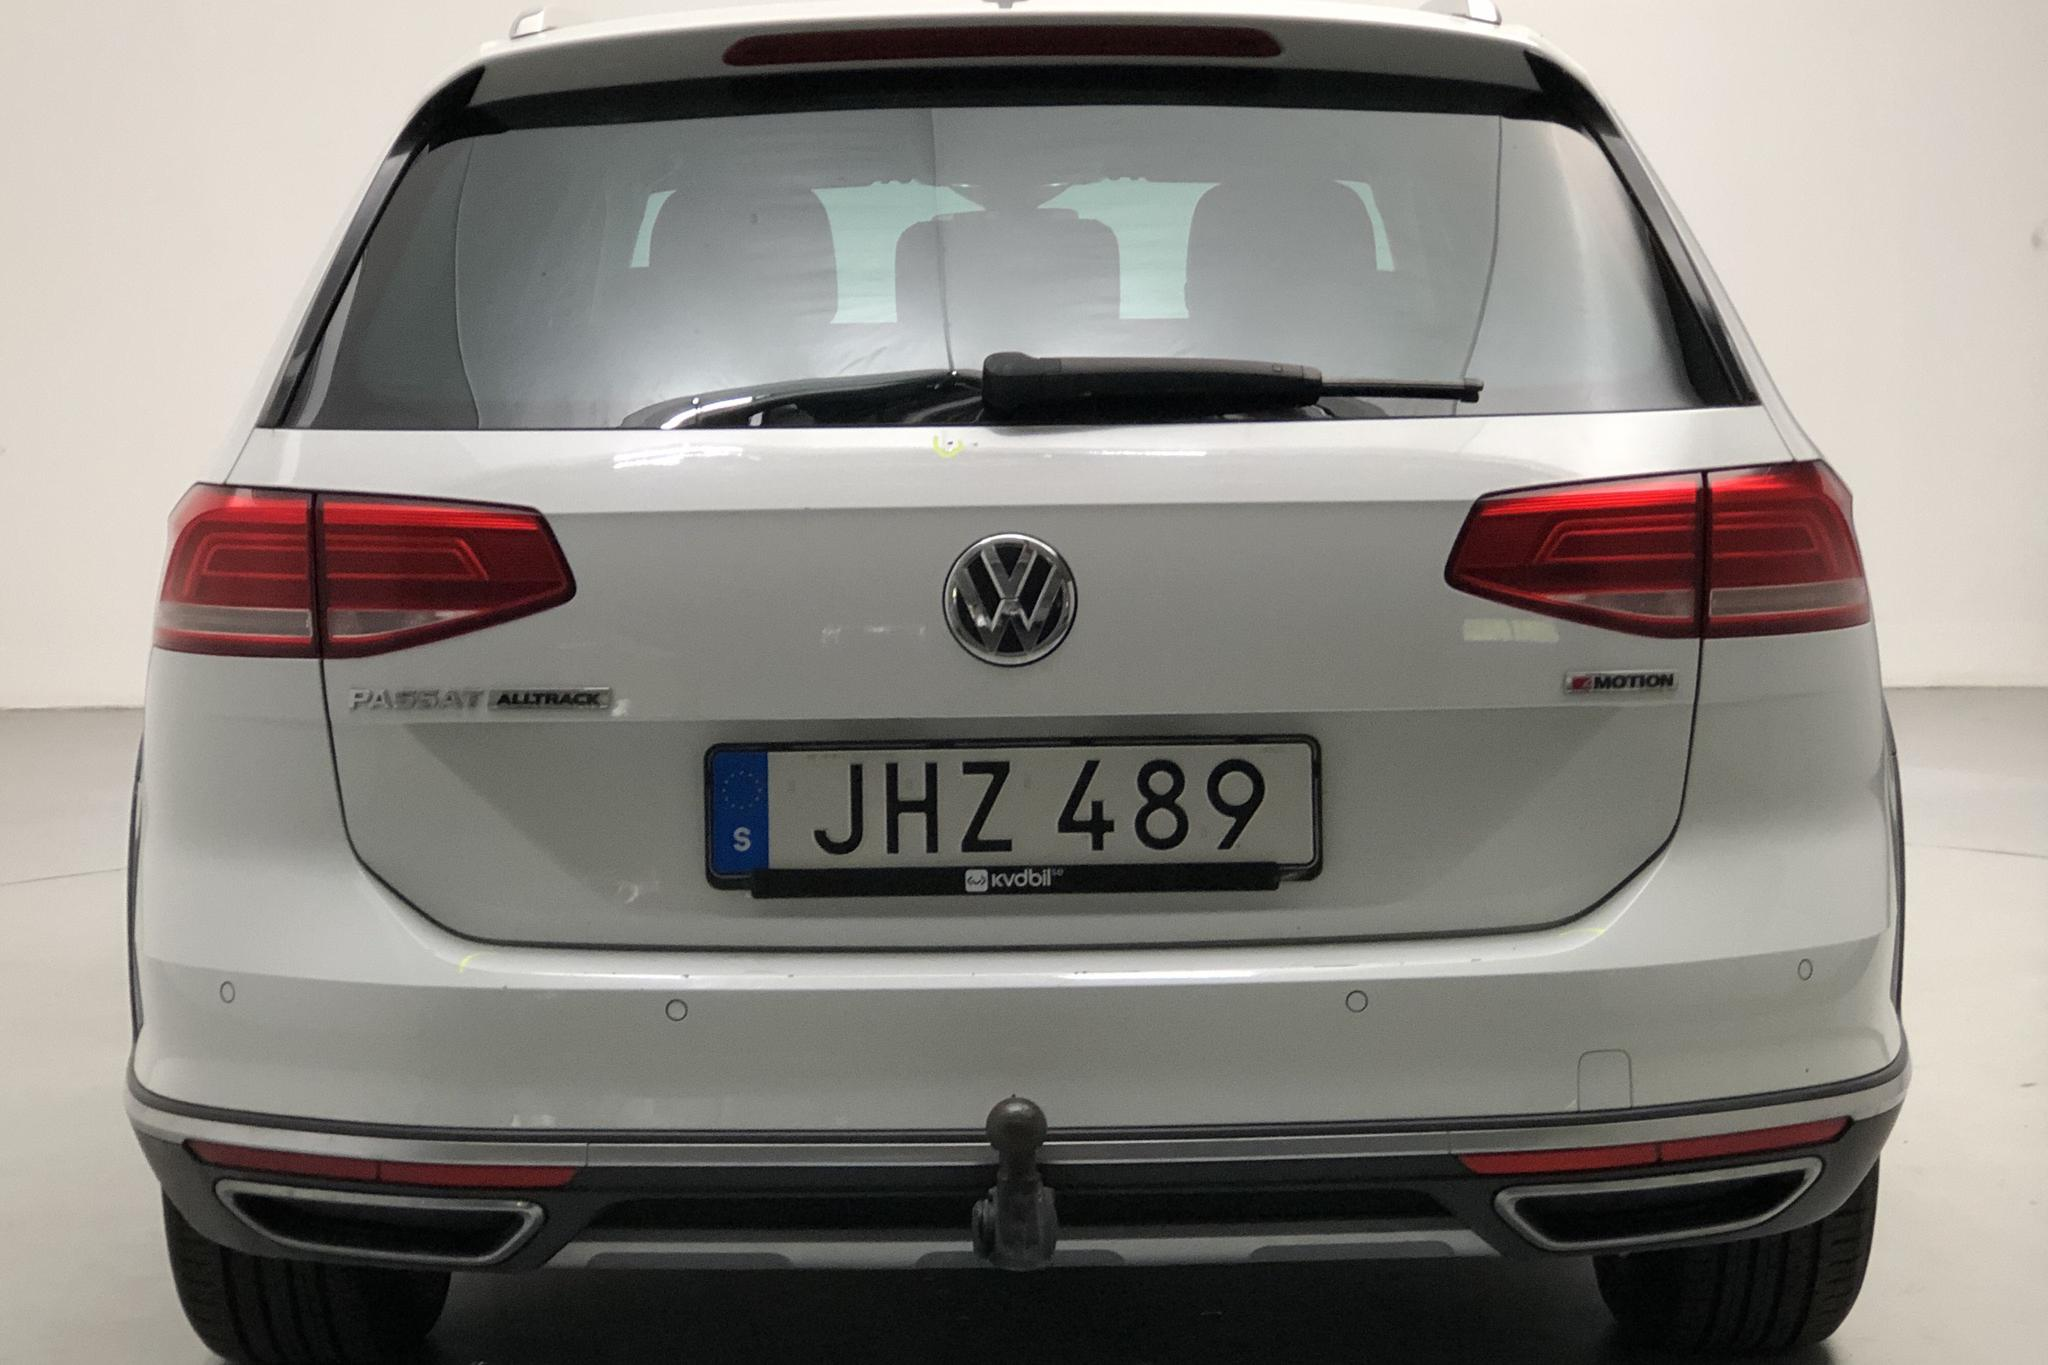 VW Passat 2.0 TDI Sportscombi 4MOTION (190hk) - 123 930 km - Automatic - white - 2018